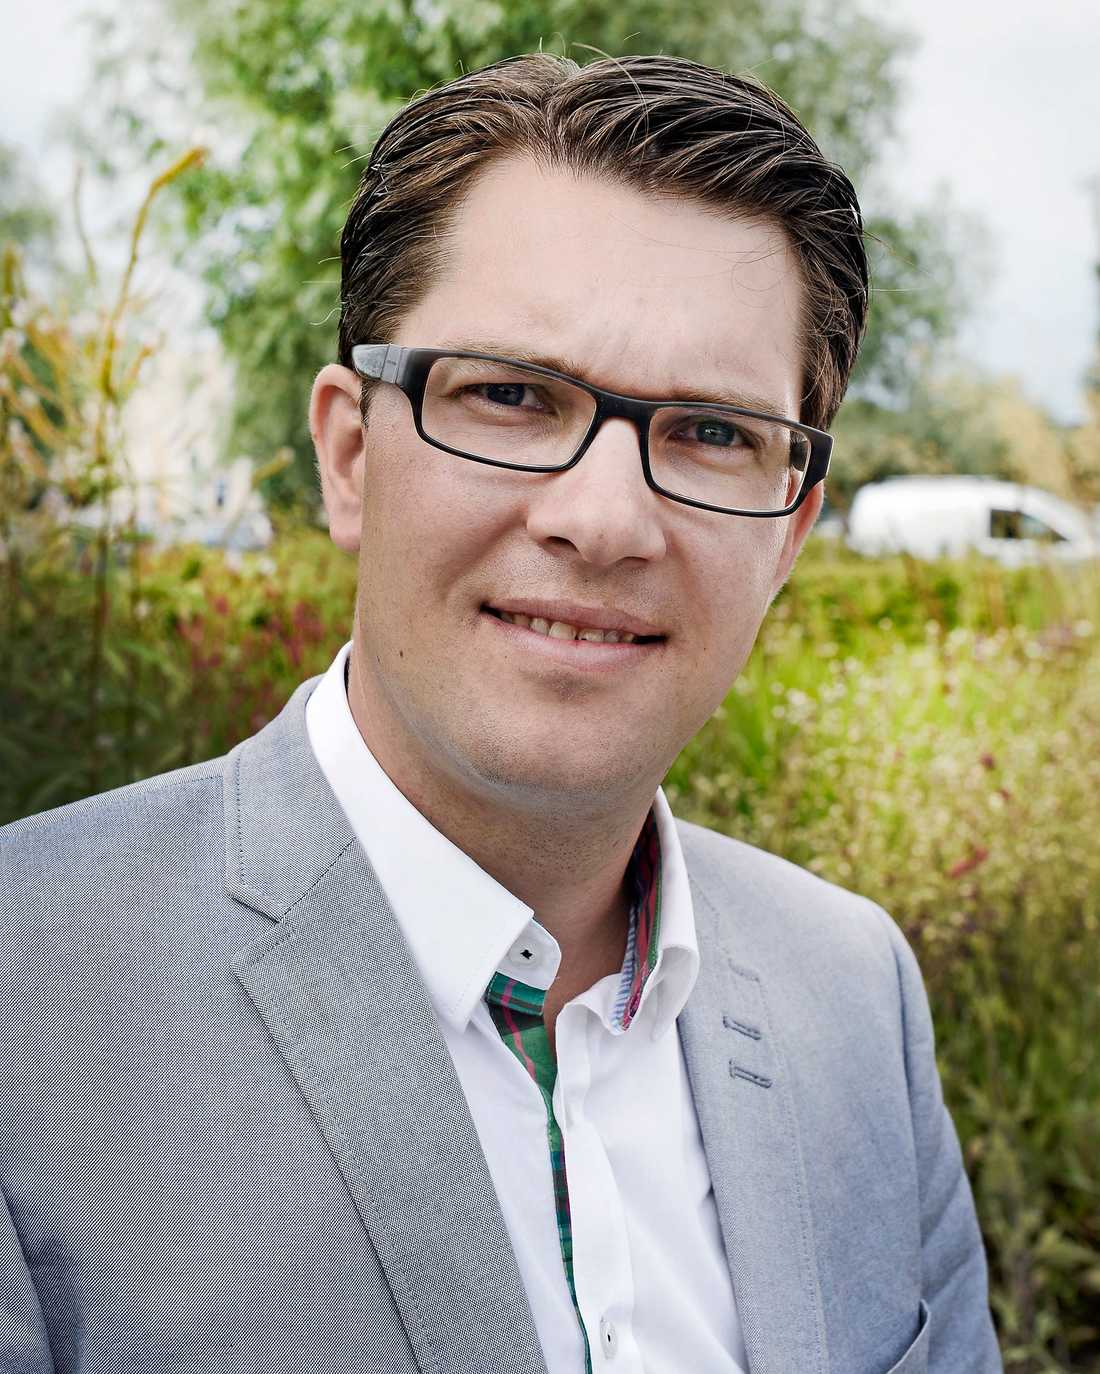 Jimmie Åkessons val i rollen som honom i filmen om honom själv? Jimmie Åkesson.